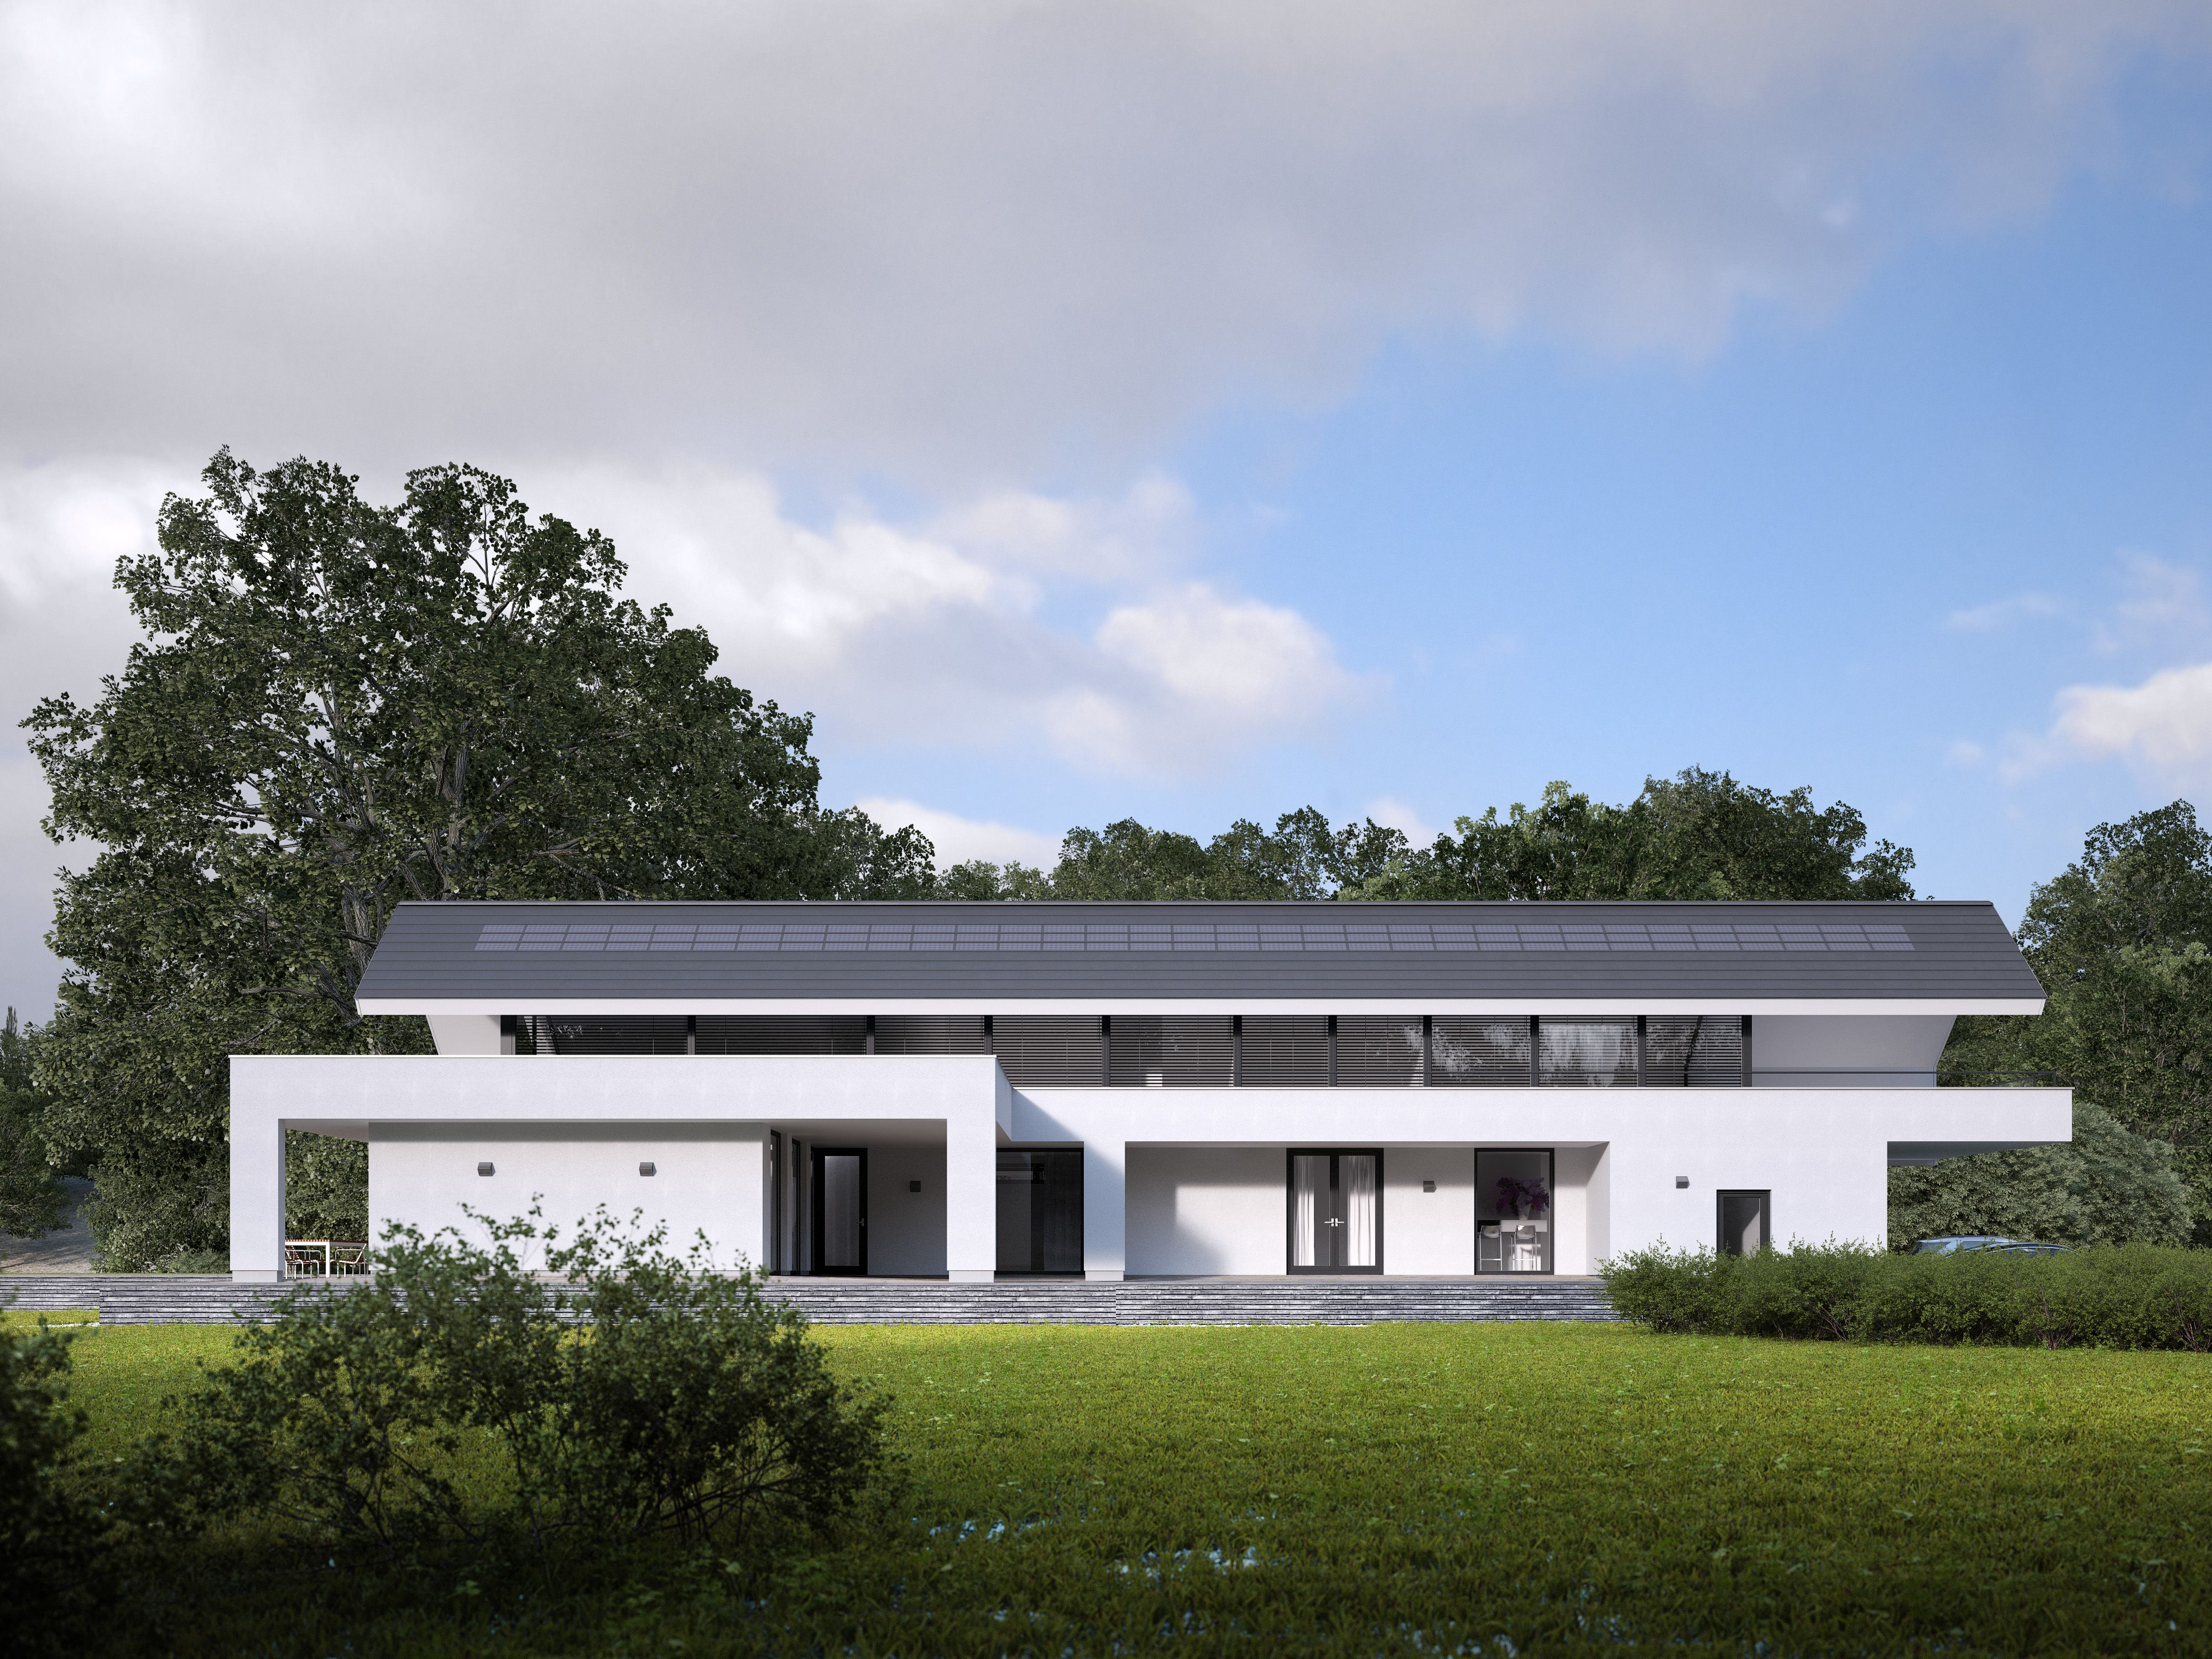 Kingston, solarpanels, solarpower, solar, zonne-energie, zonnepanelen, zonnepanelen in dakpan, modern, architecture